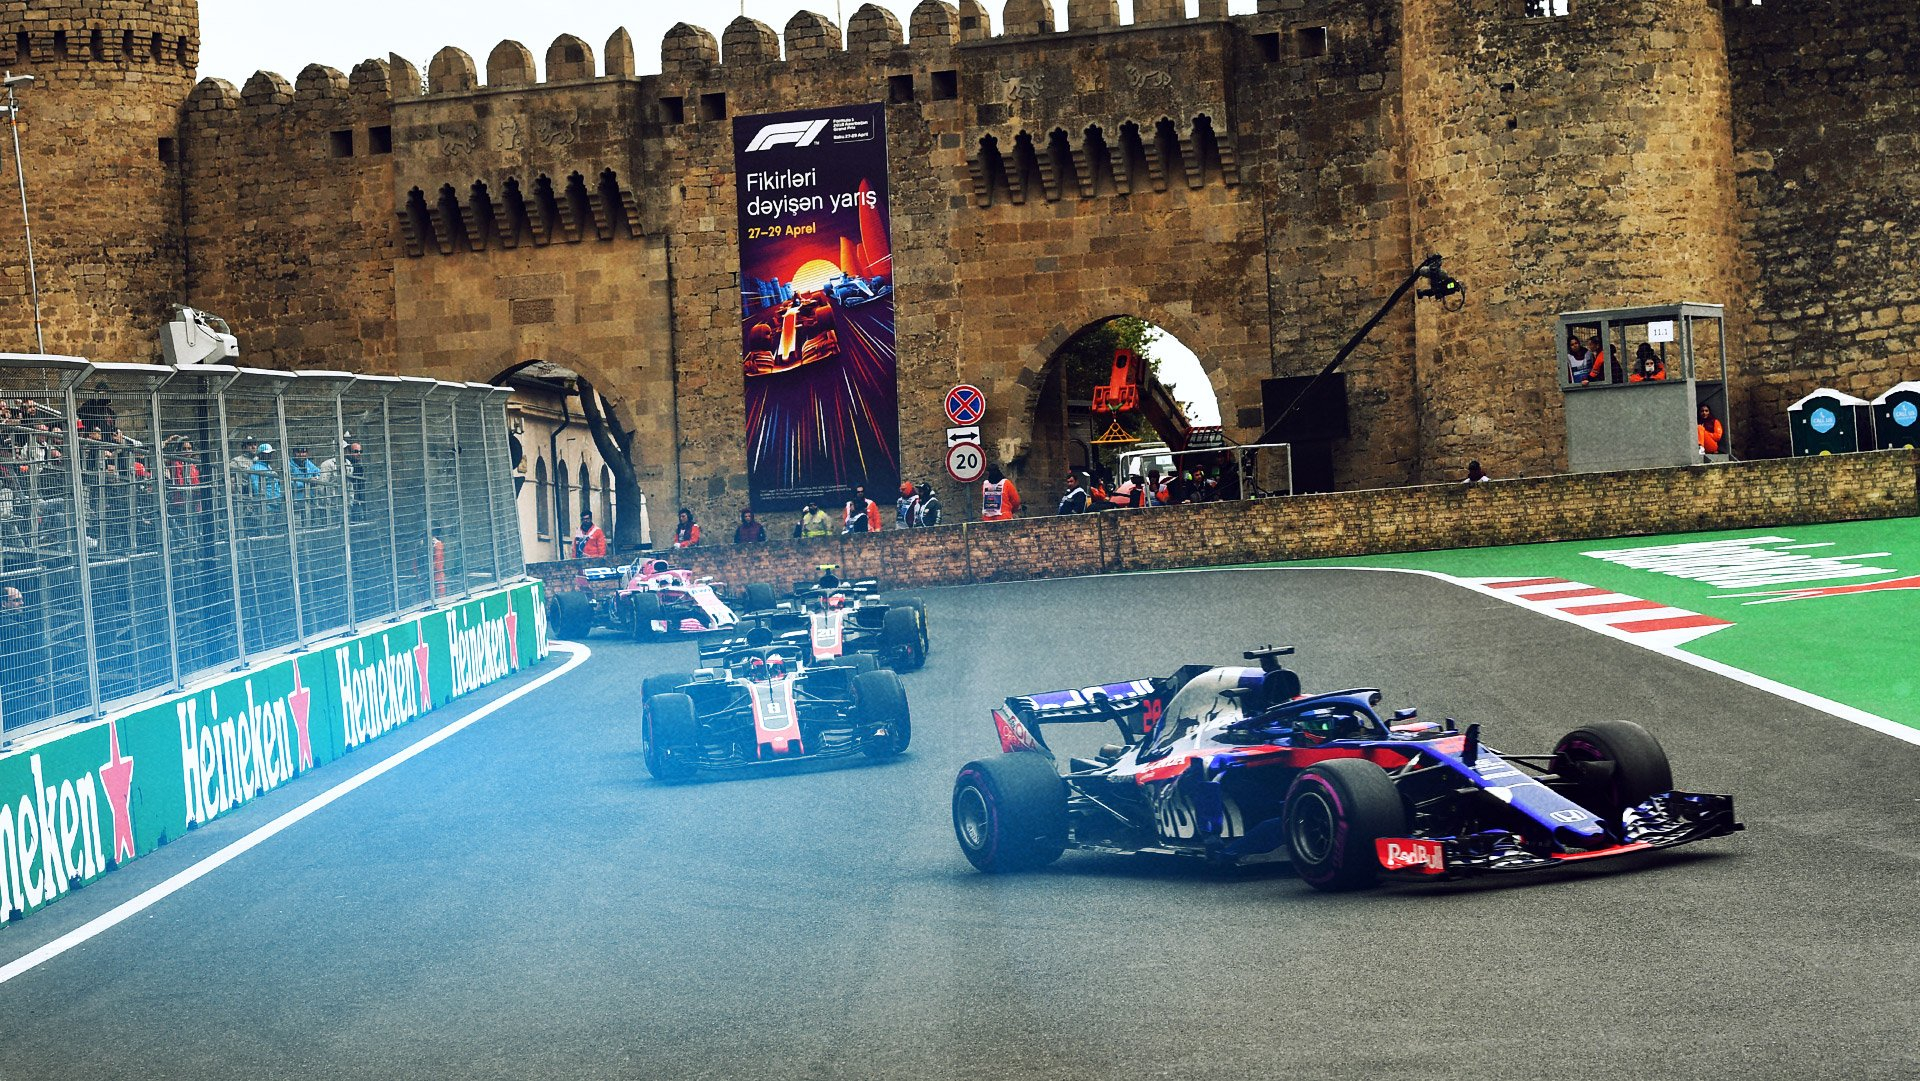 F1 Schedule 2019 – Official Calendar Of Grand Prix Races Formula 1 Calendar 2019 Dates